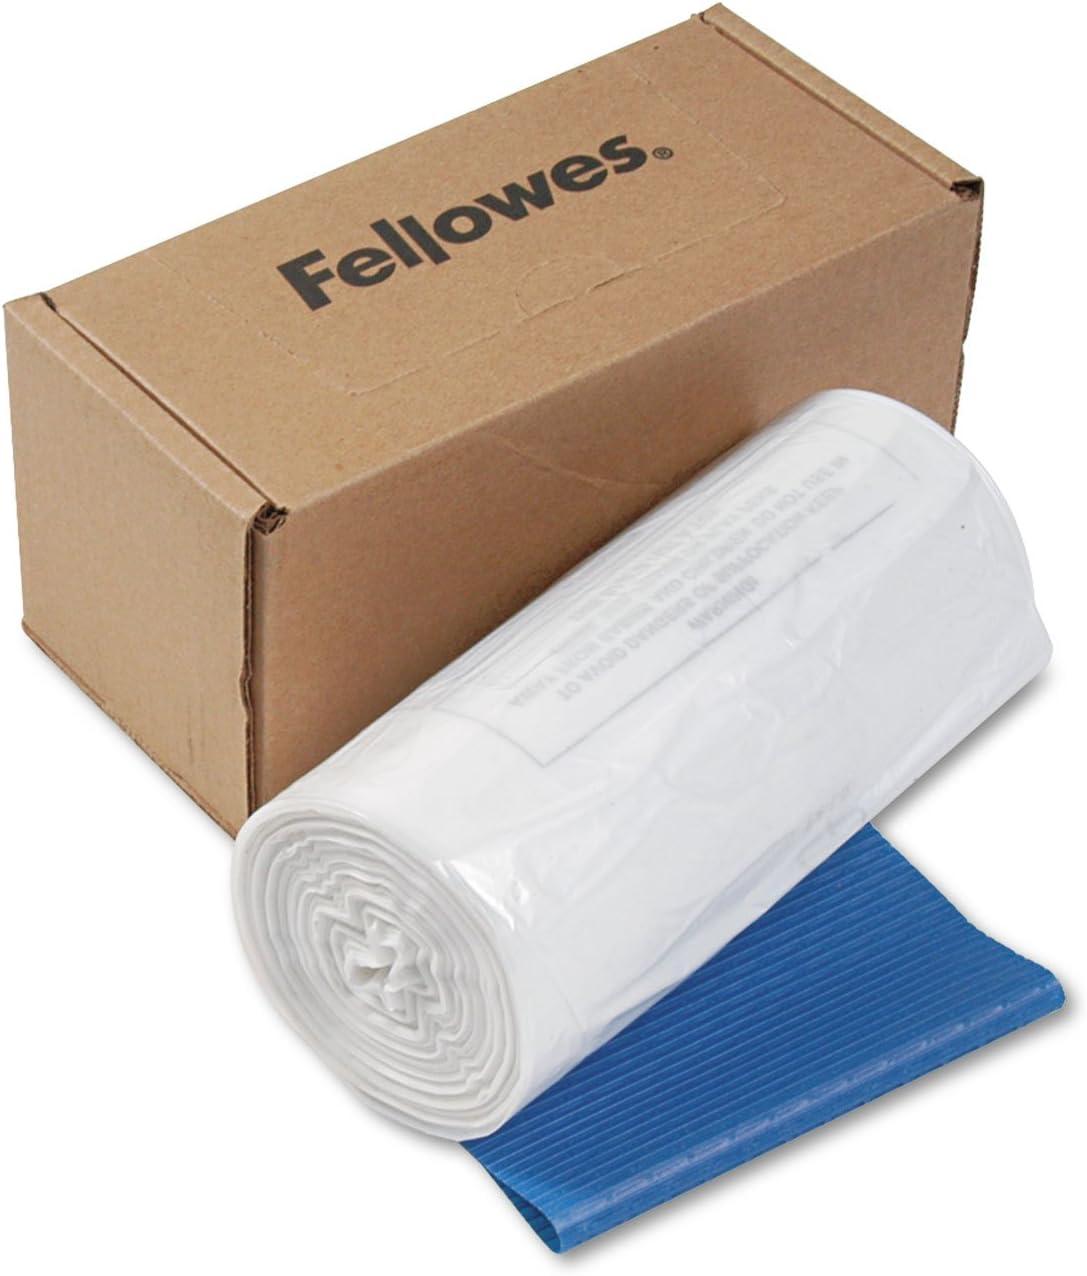 Fellowes 36054 Shredder Bags 20 Gal 2250 x F Max 65% OFF 18-Inch Max 81% OFF 125 Series